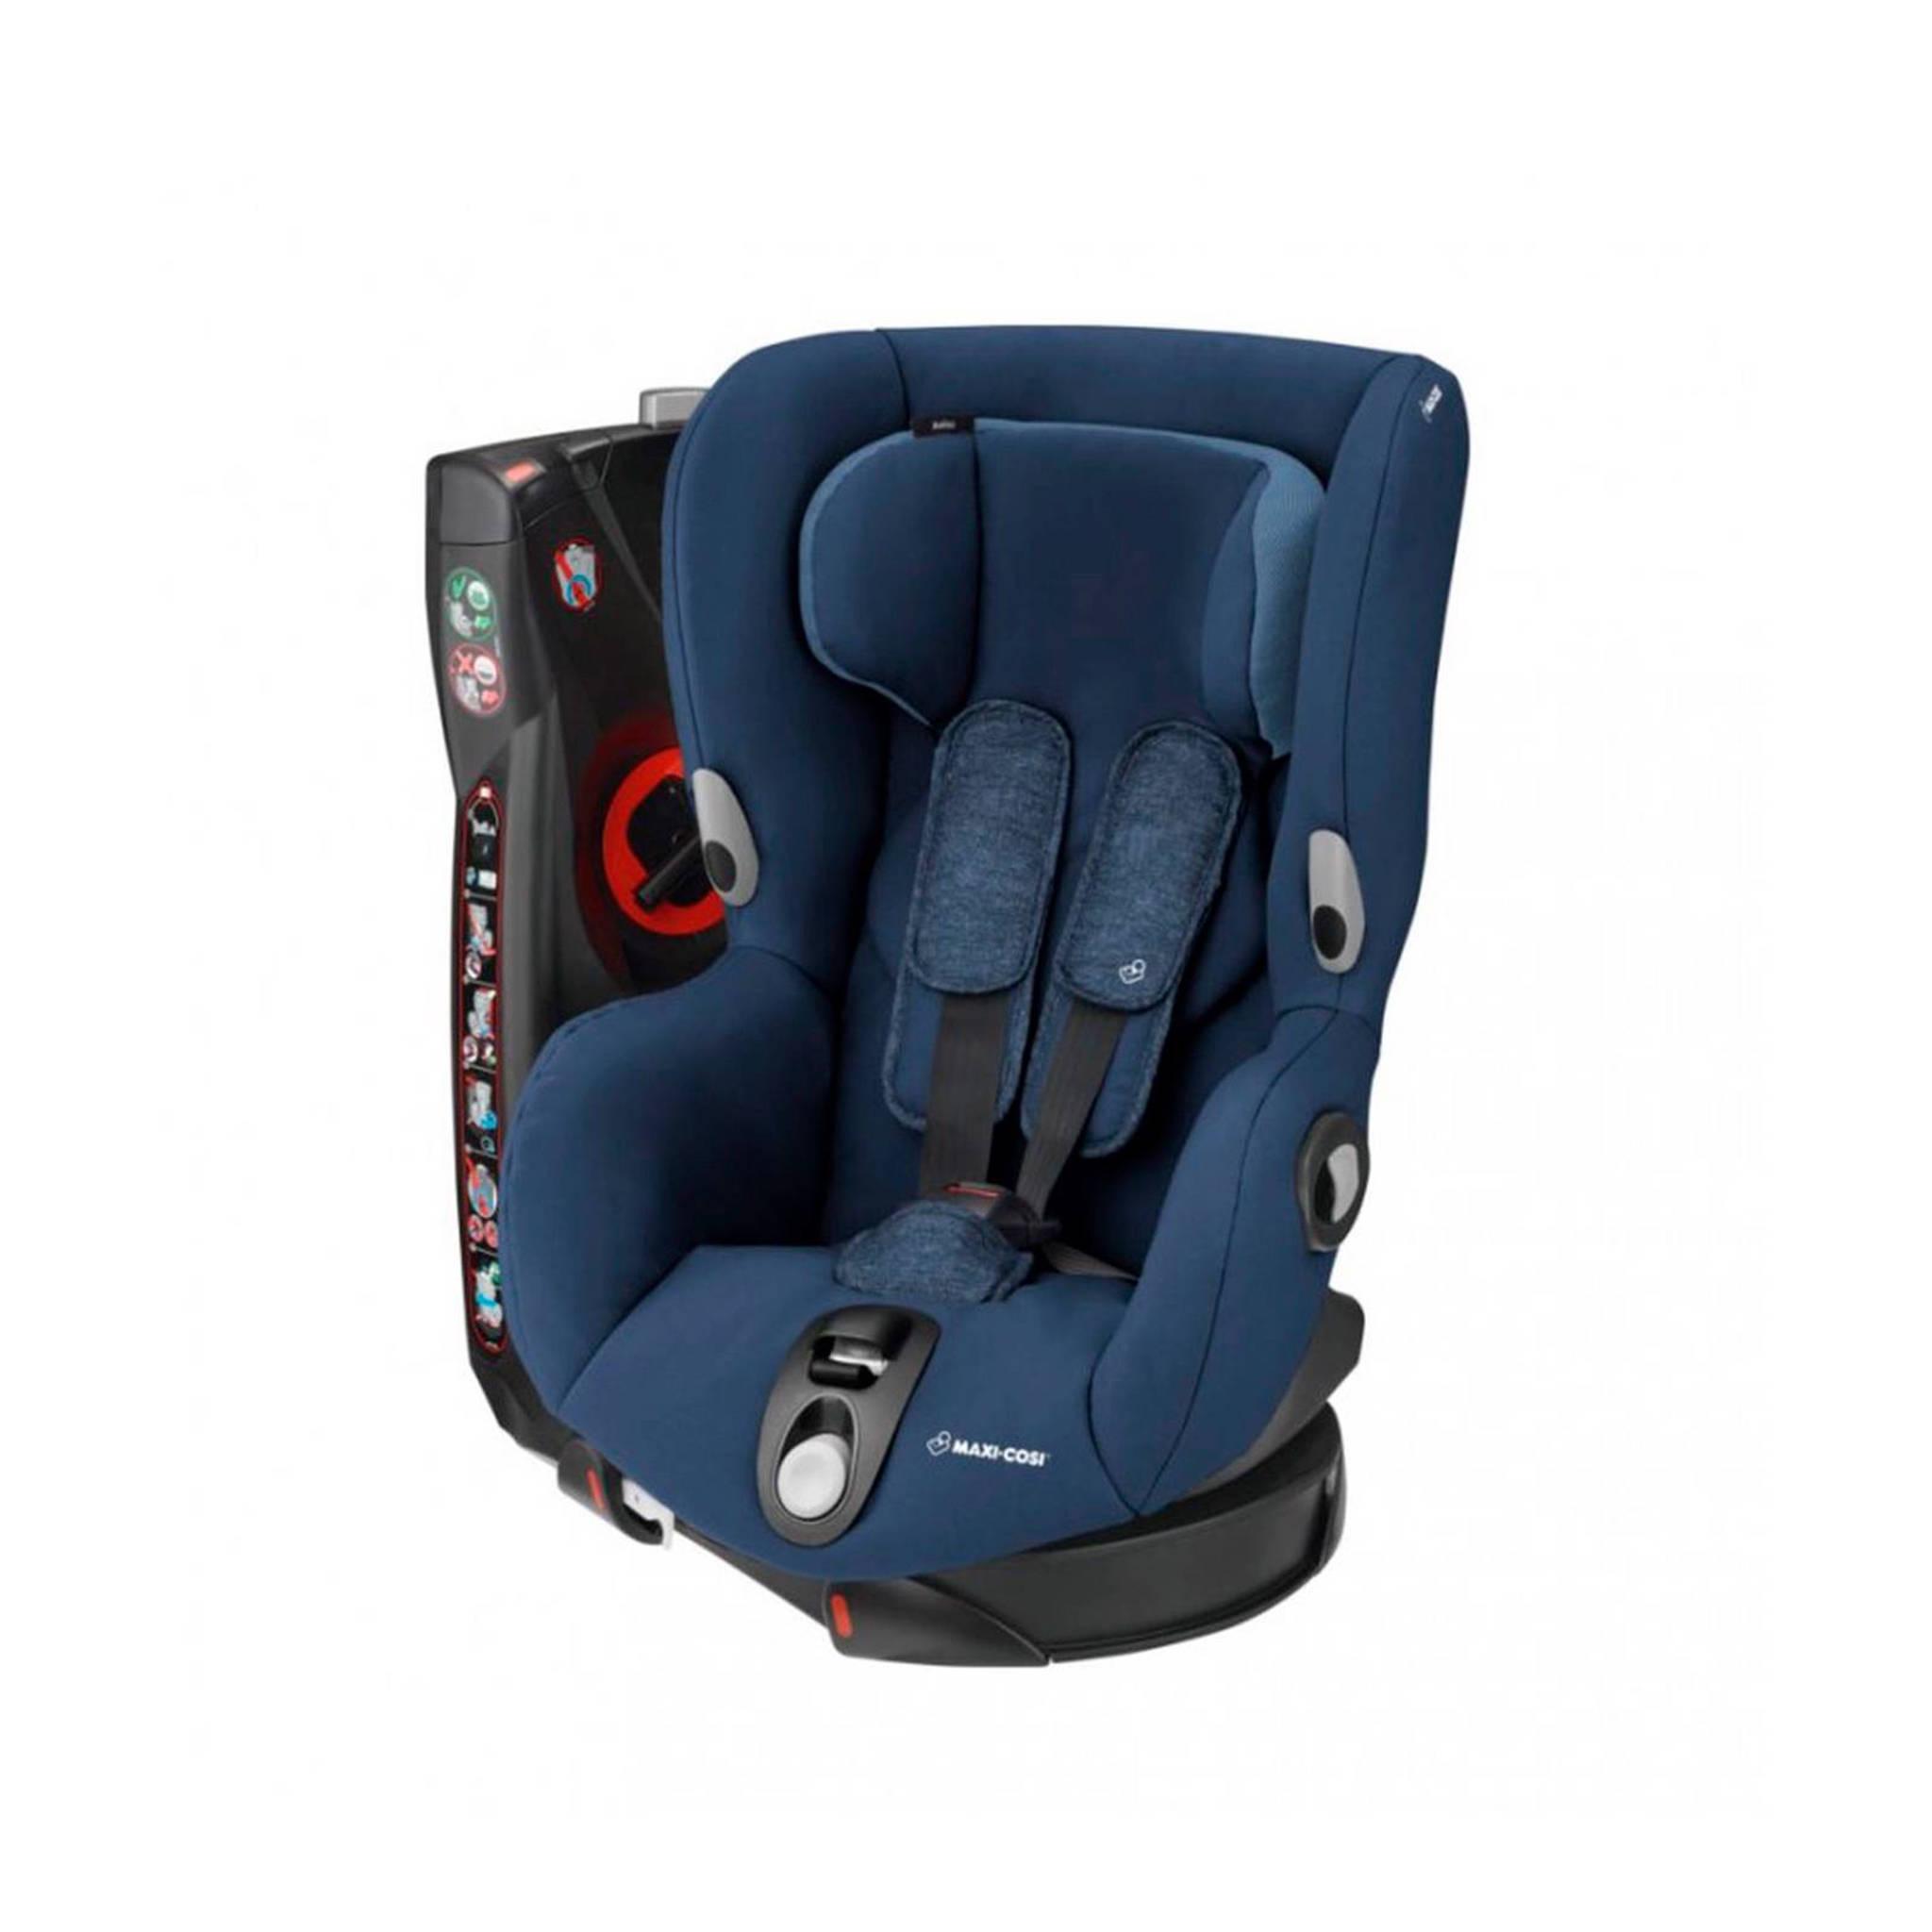 Maxi Cosi Autostoel Groep 1.Maxi Cosi Axiss Autostoel Groep 1 Nomad Blue Wehkamp